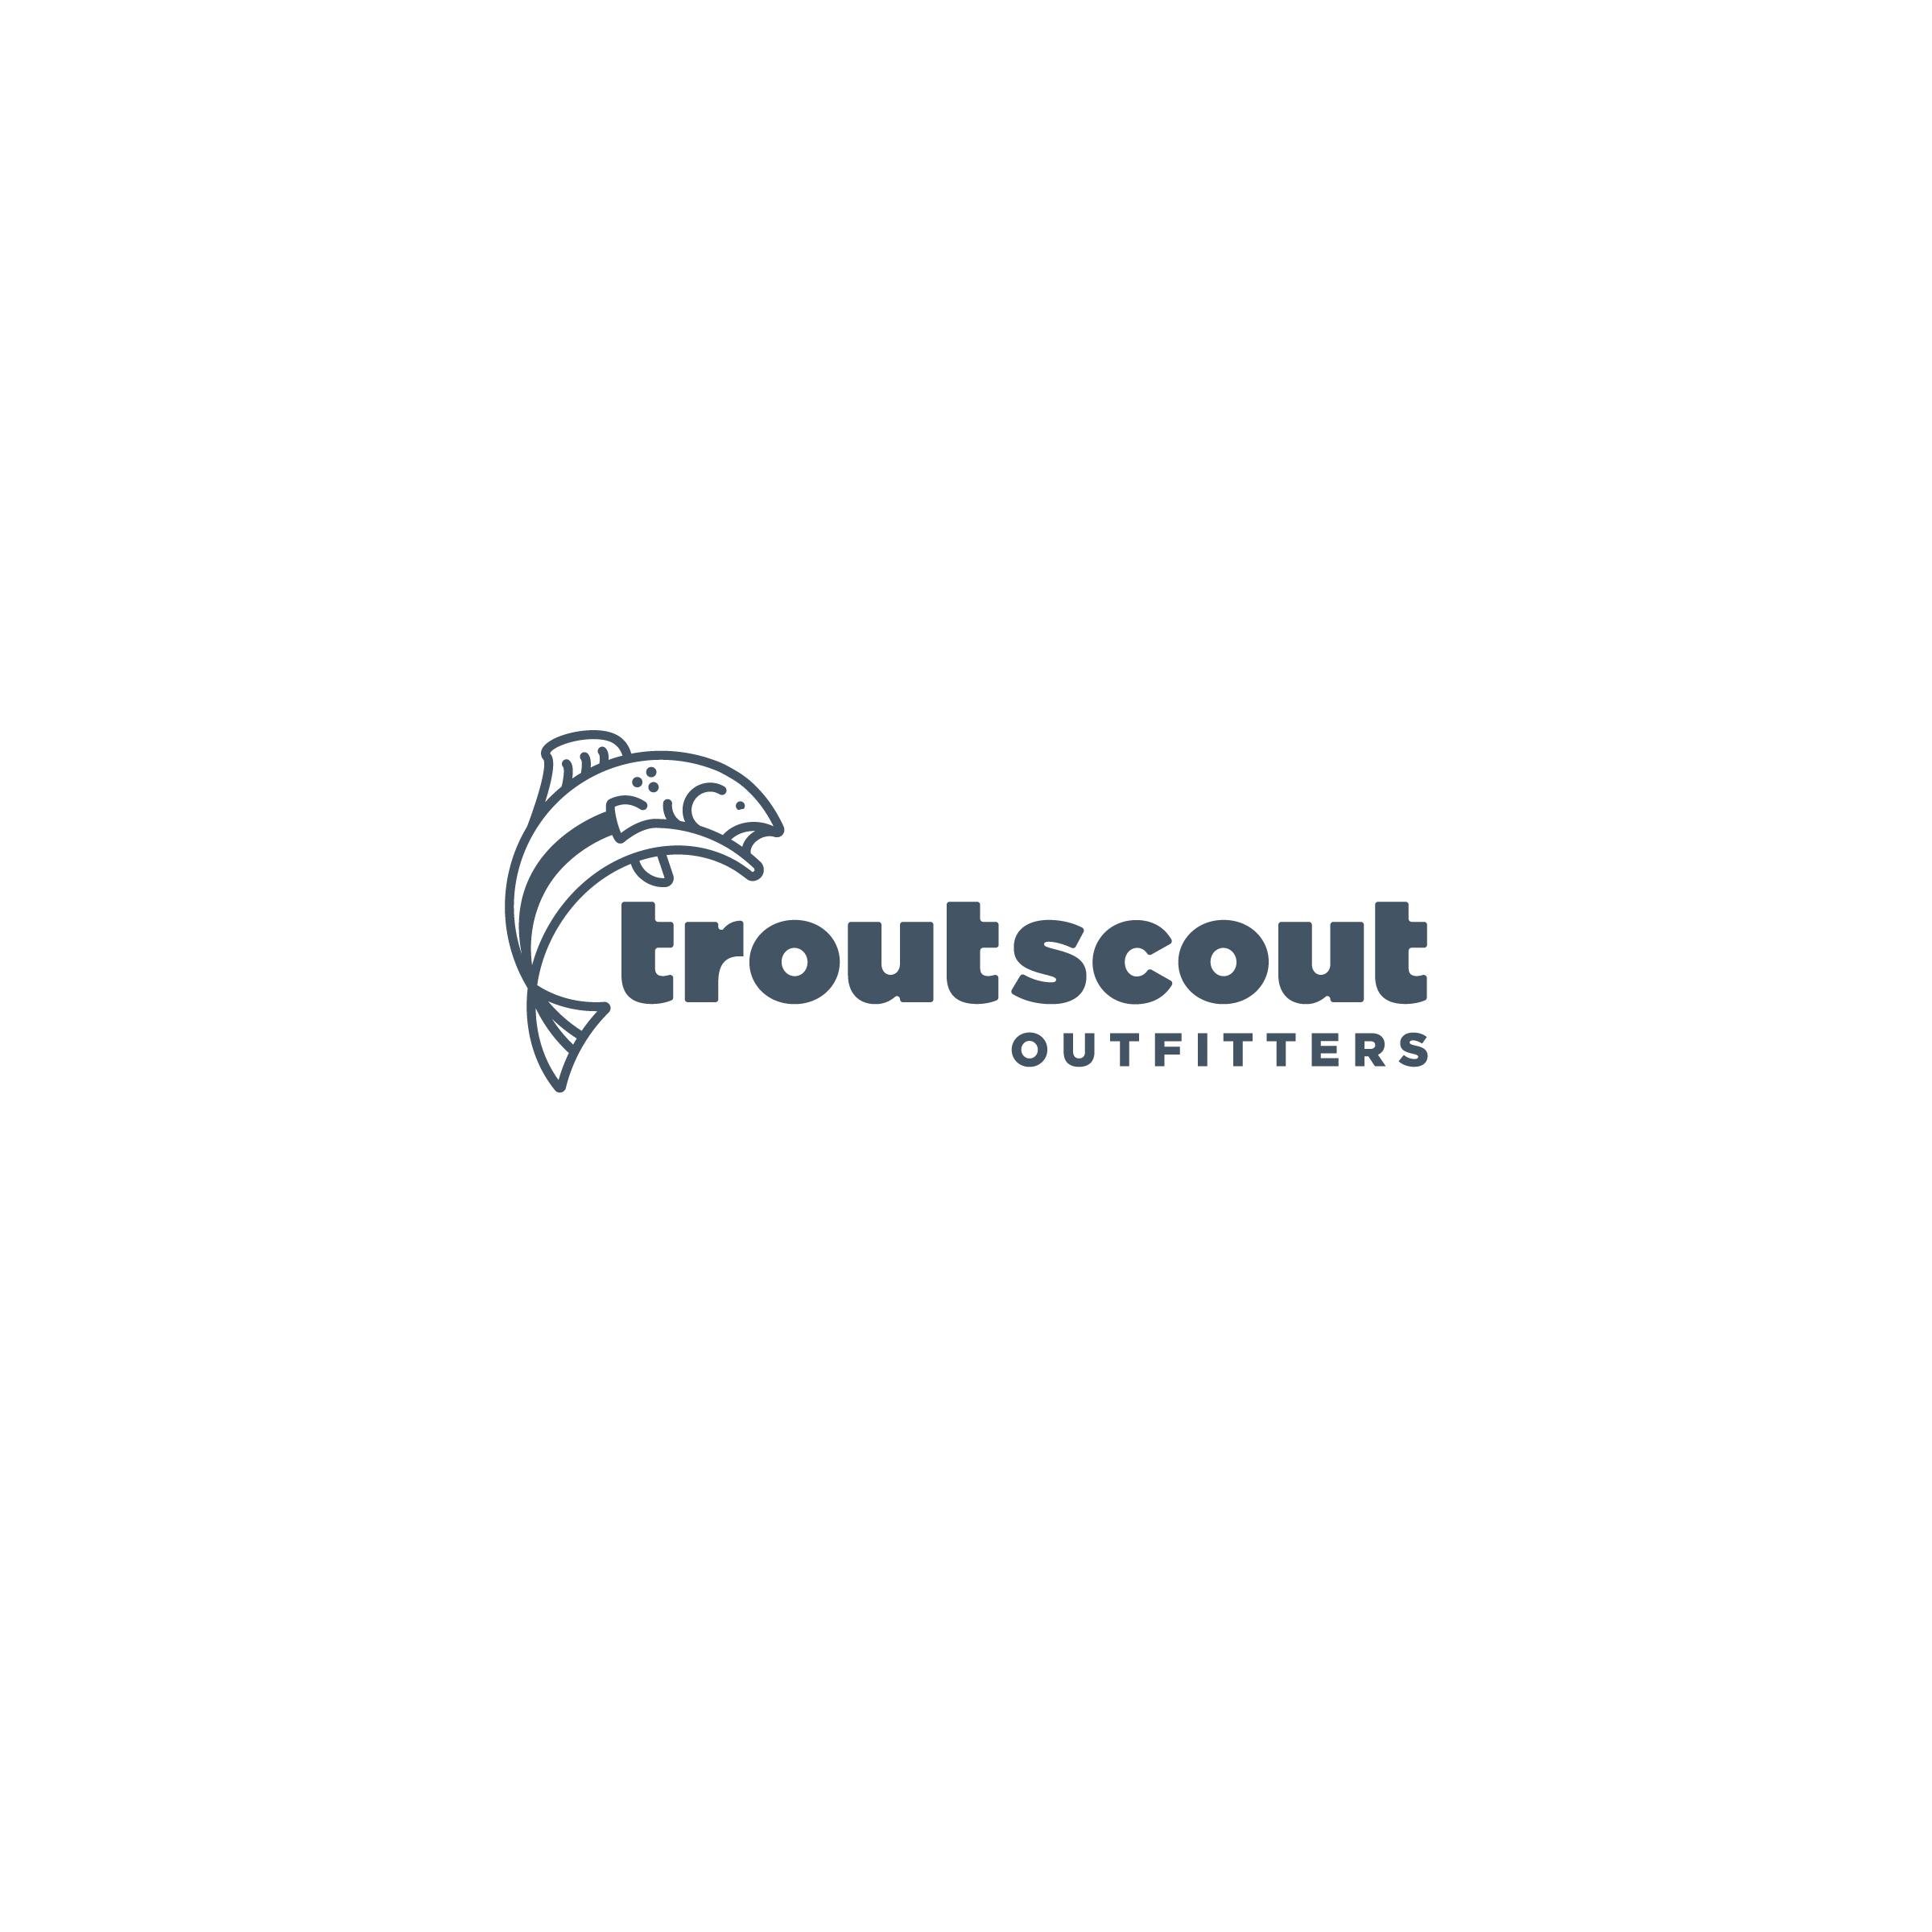 TroutScoutOutfitters_DkBlue_Hrzt.jpg